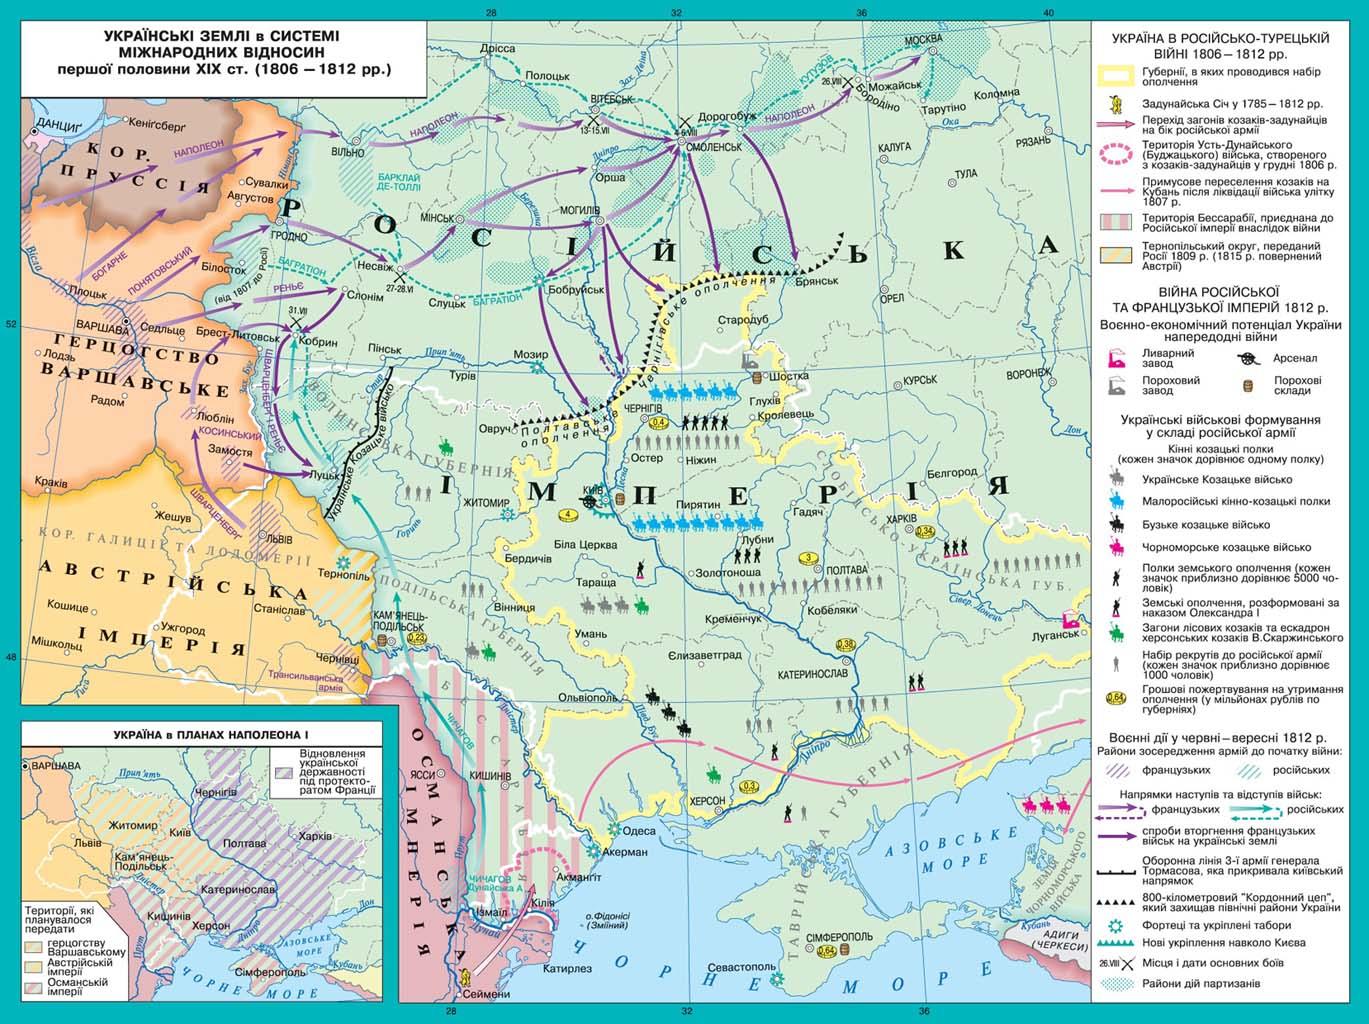 русско турецкая война 1806